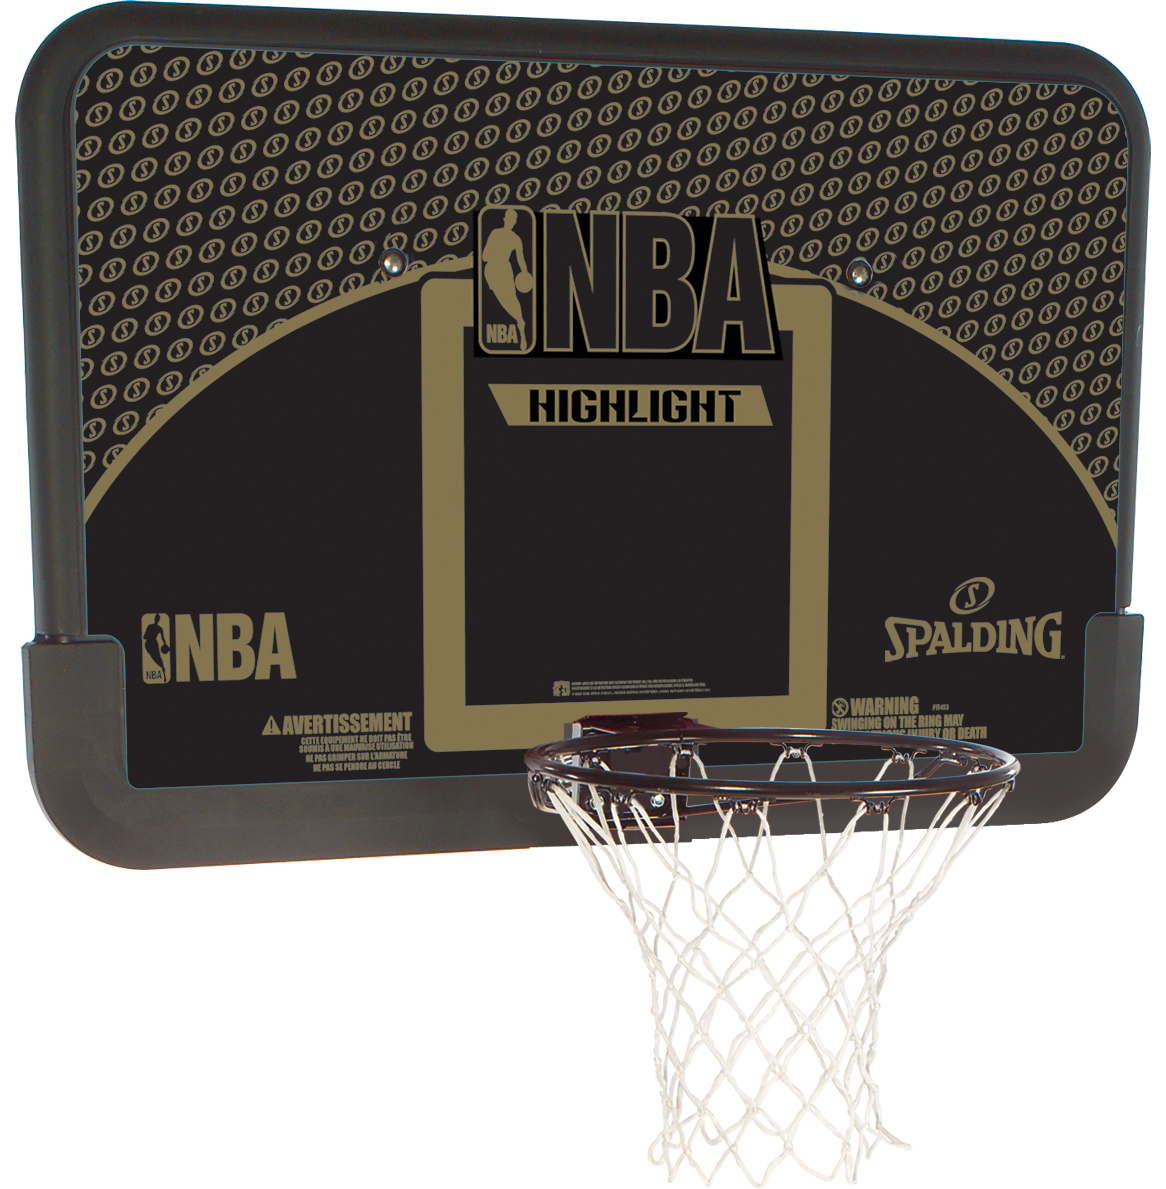 Spalding Баскетбольный щит Highlight 44 Composite